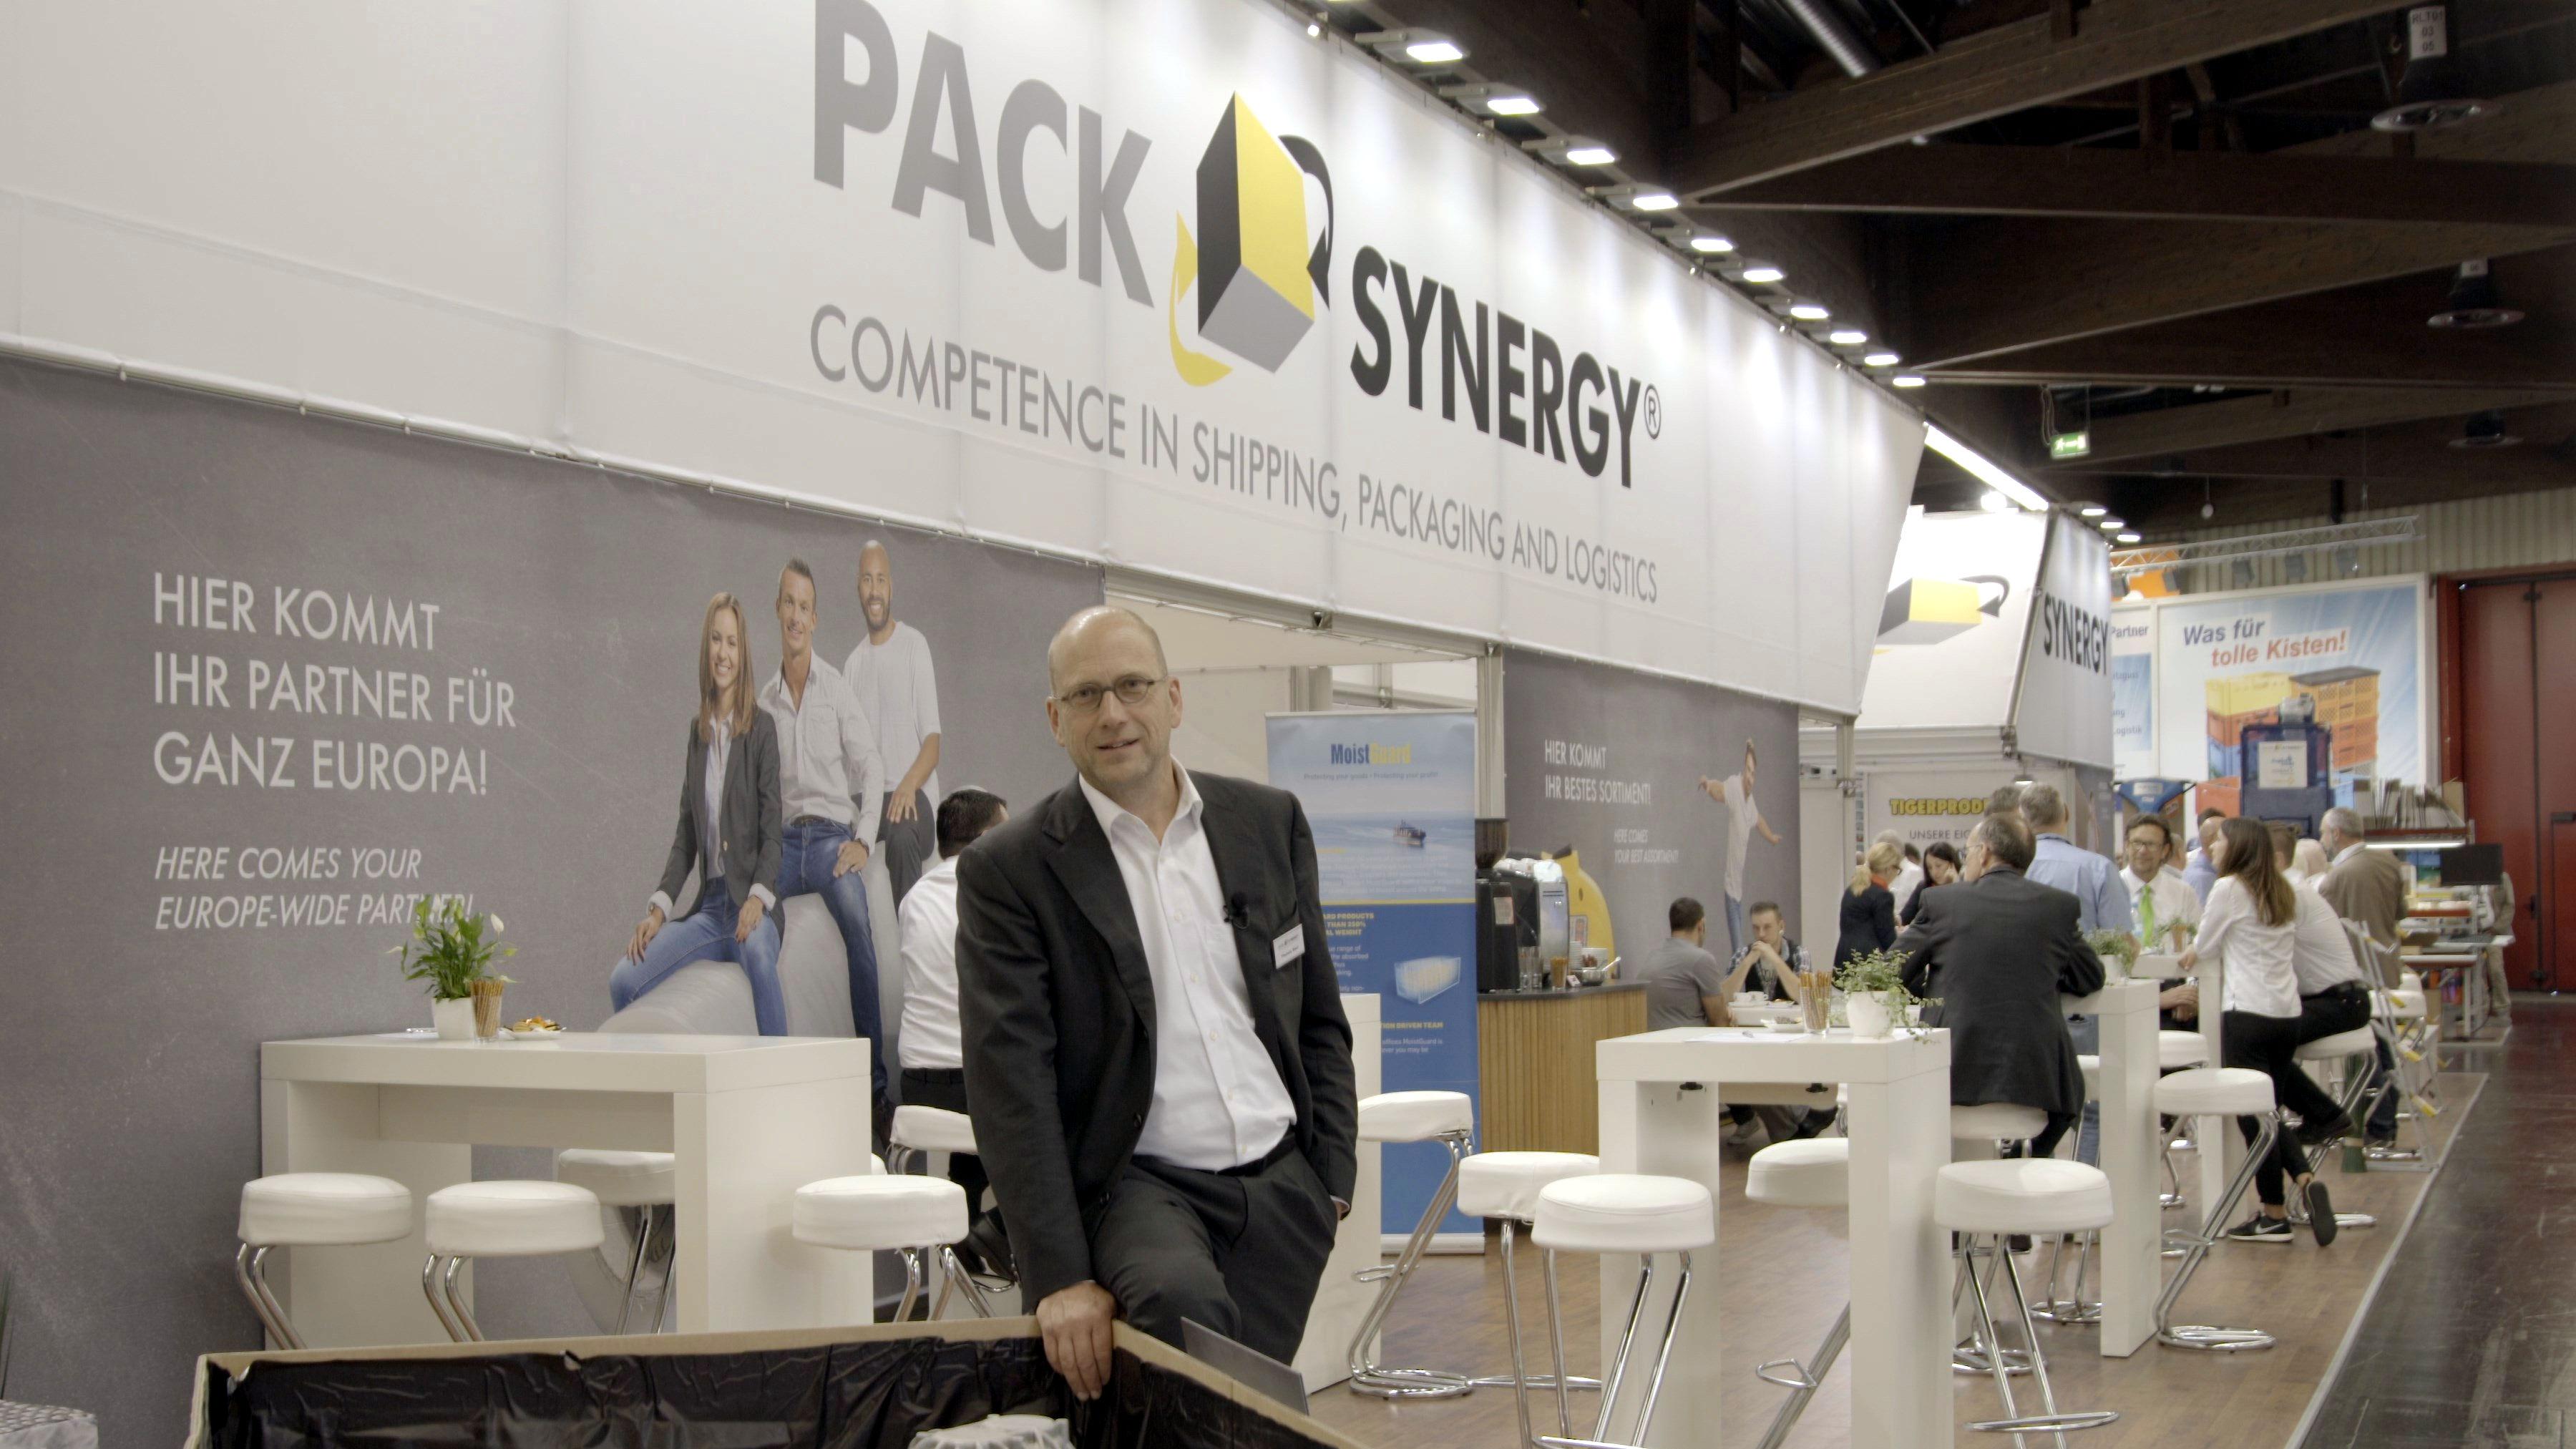 packsynergy